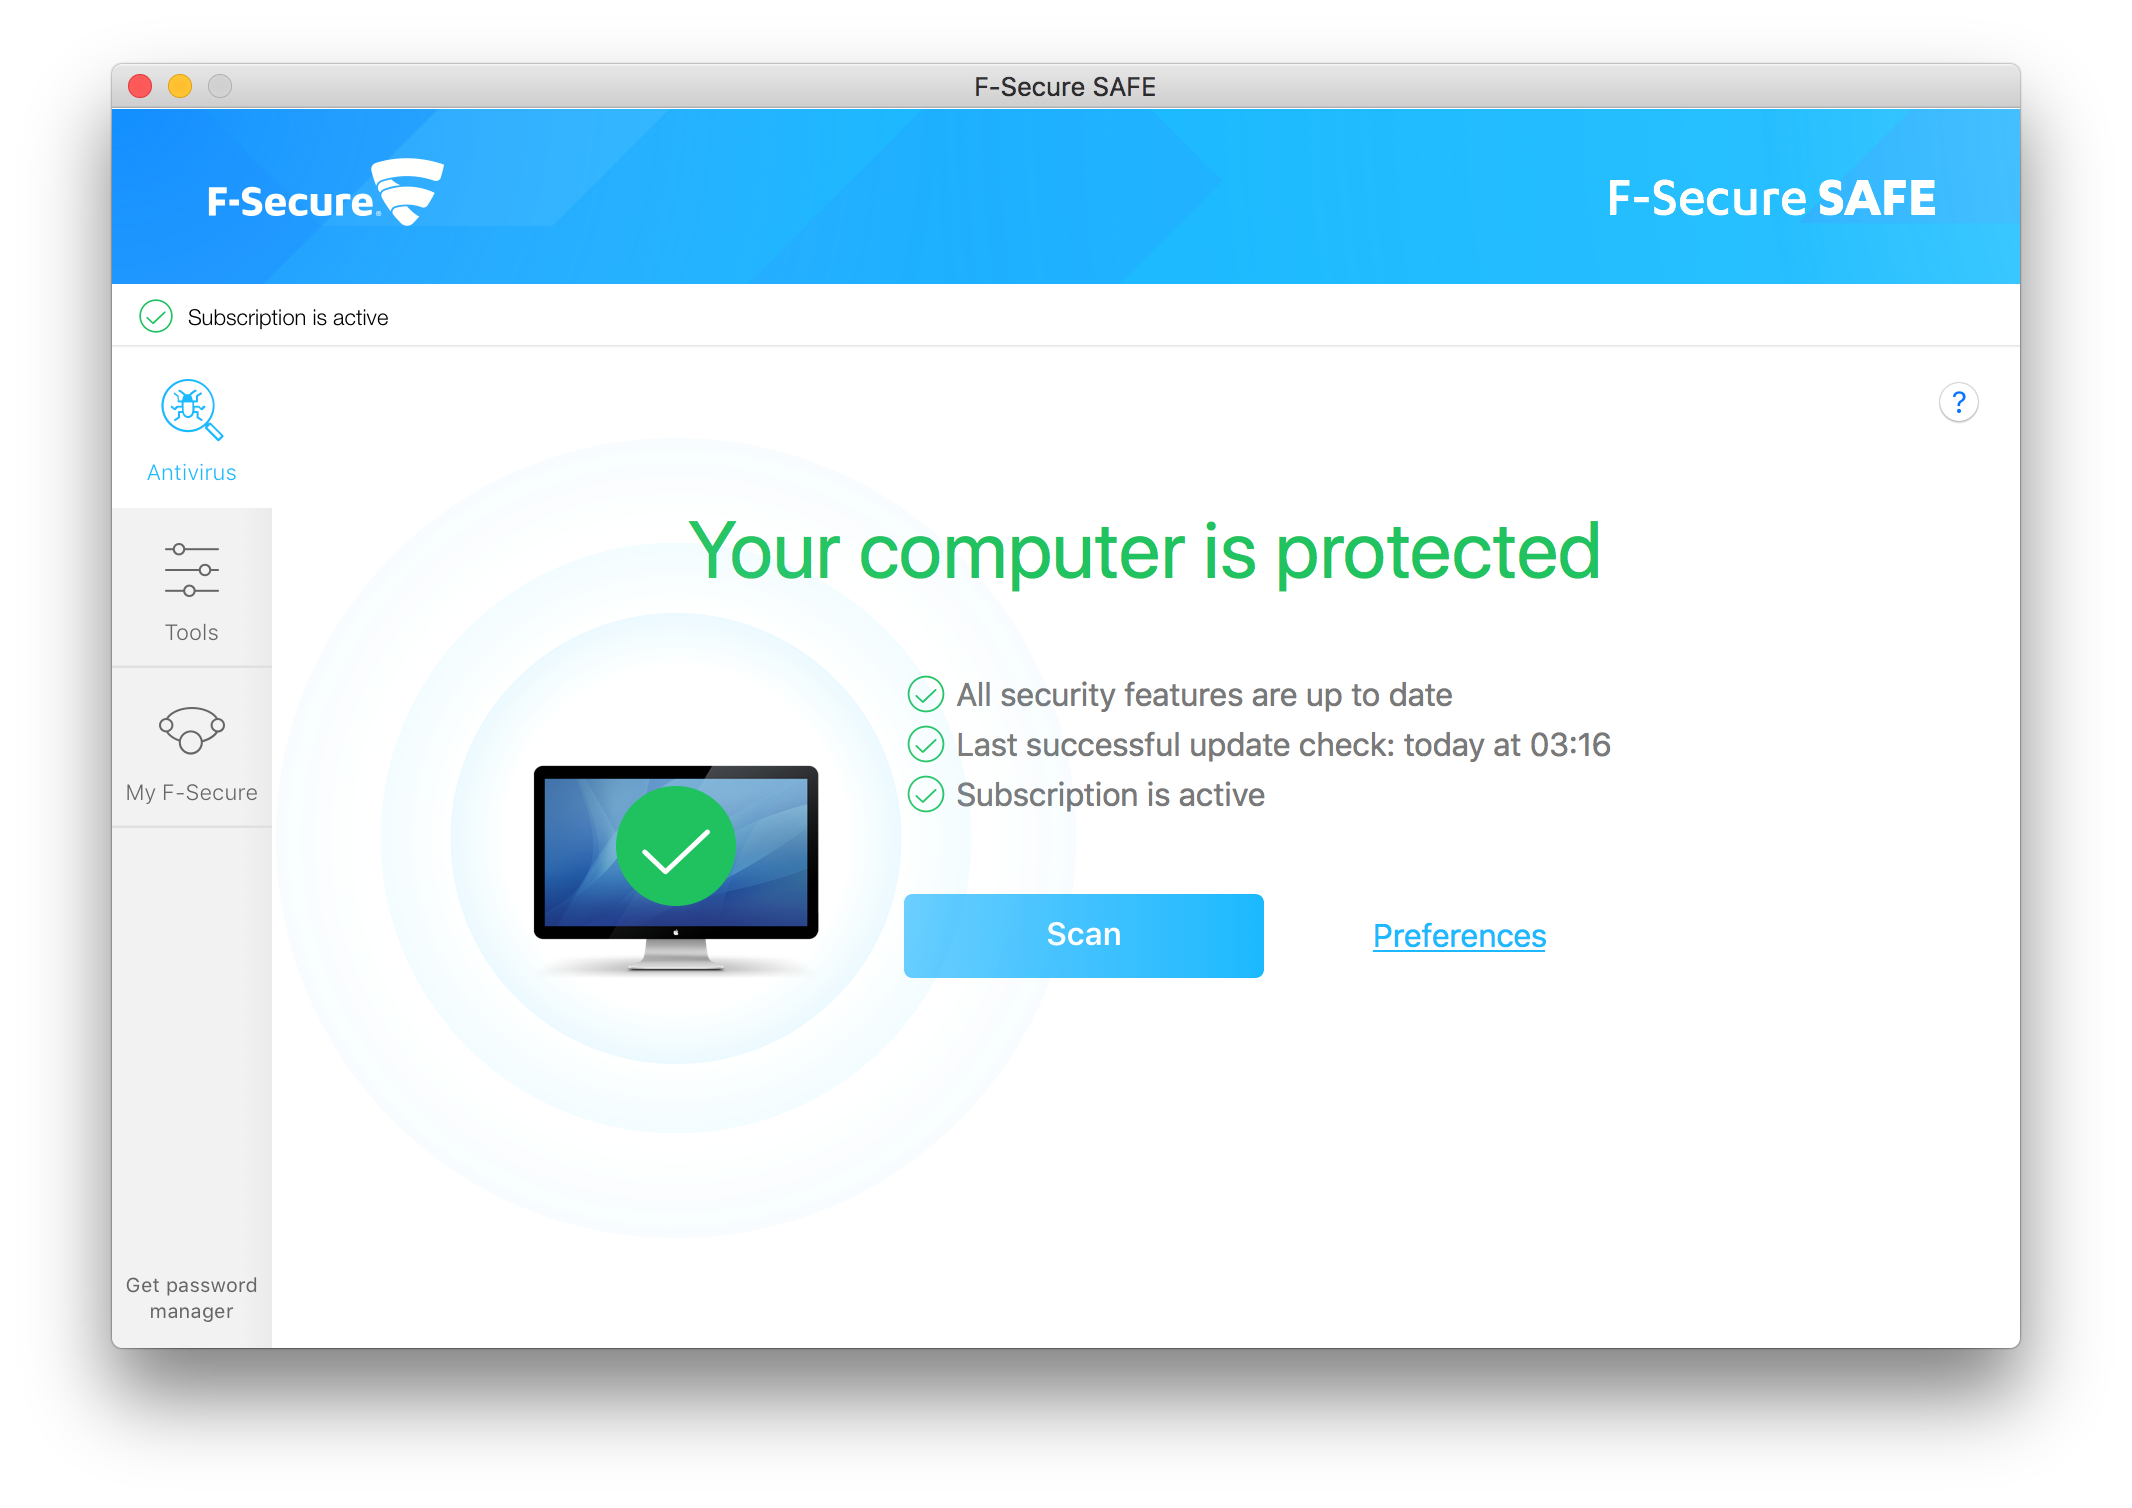 F-Secure SAFE for Mac